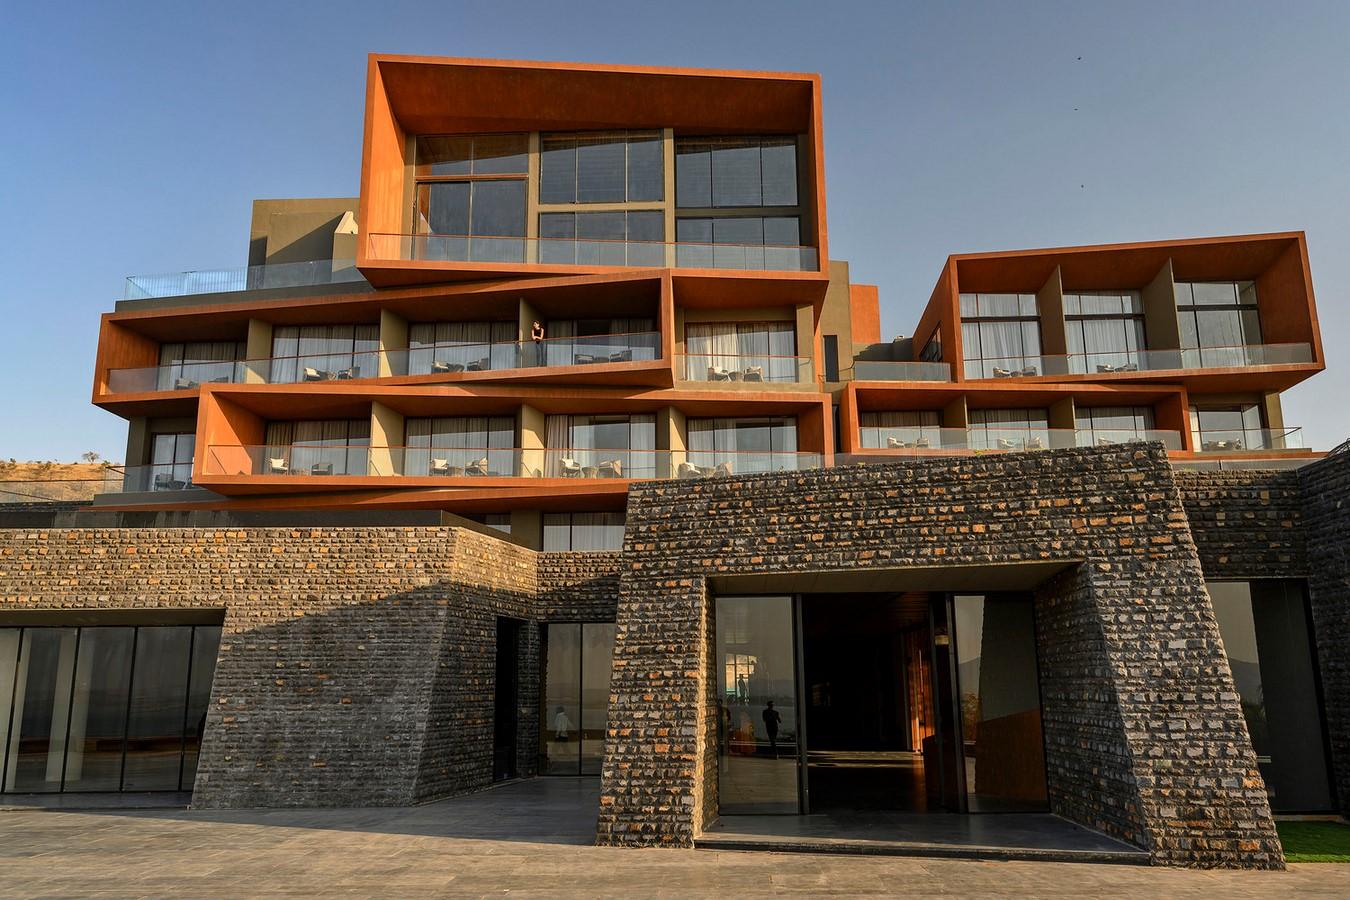 Aria Hotel by Sanjay Puri Architects: Capturing the Beauty - Sheet4